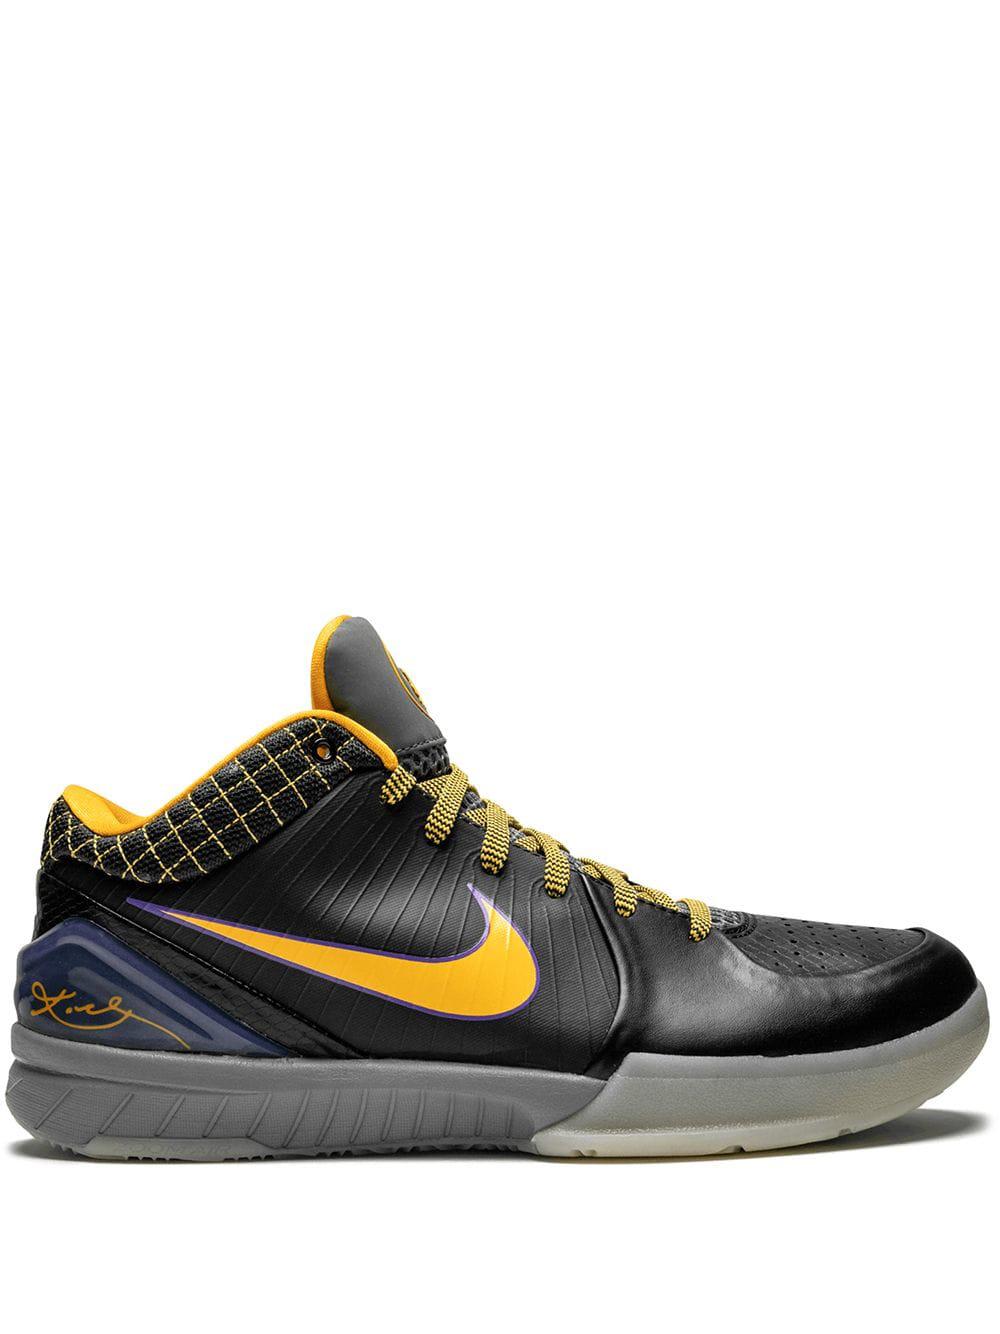 hot sale online fdcb4 206a1 Nike Zoom Kobe 4 Trainers - Black